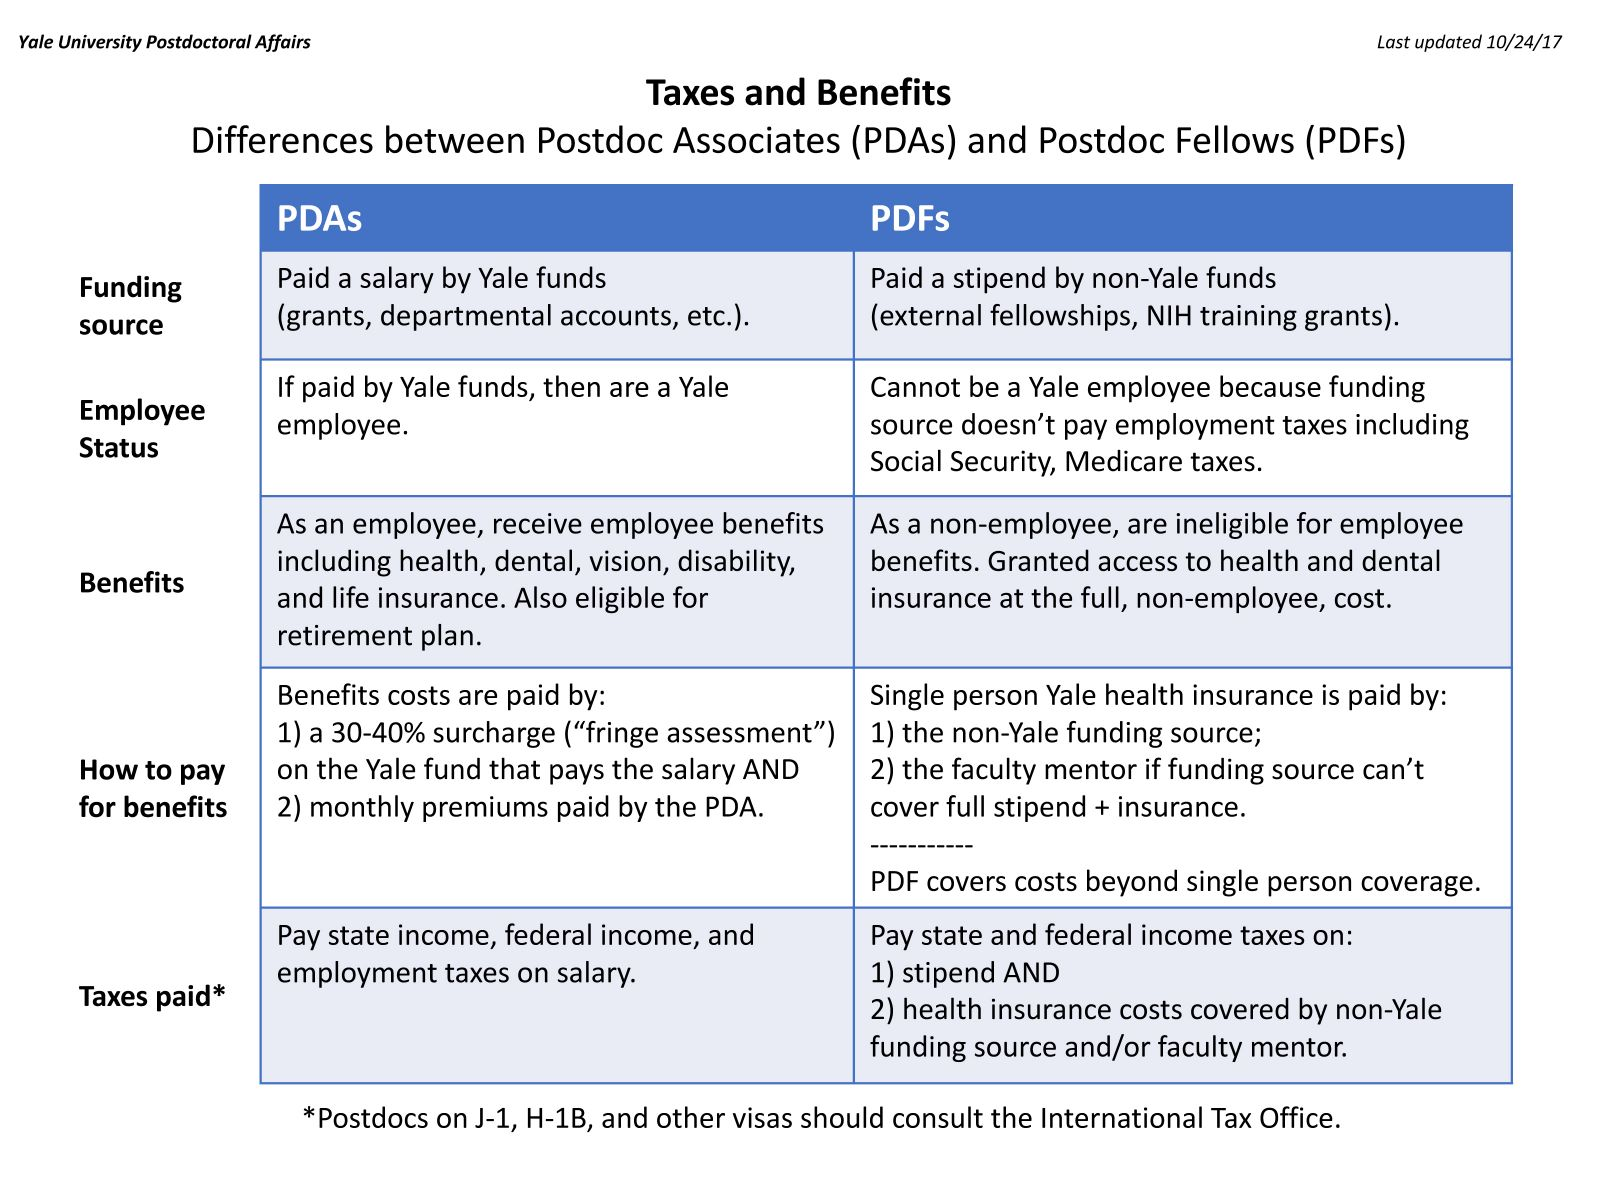 Differences between Postdoc Associates and Postdoc Fellows